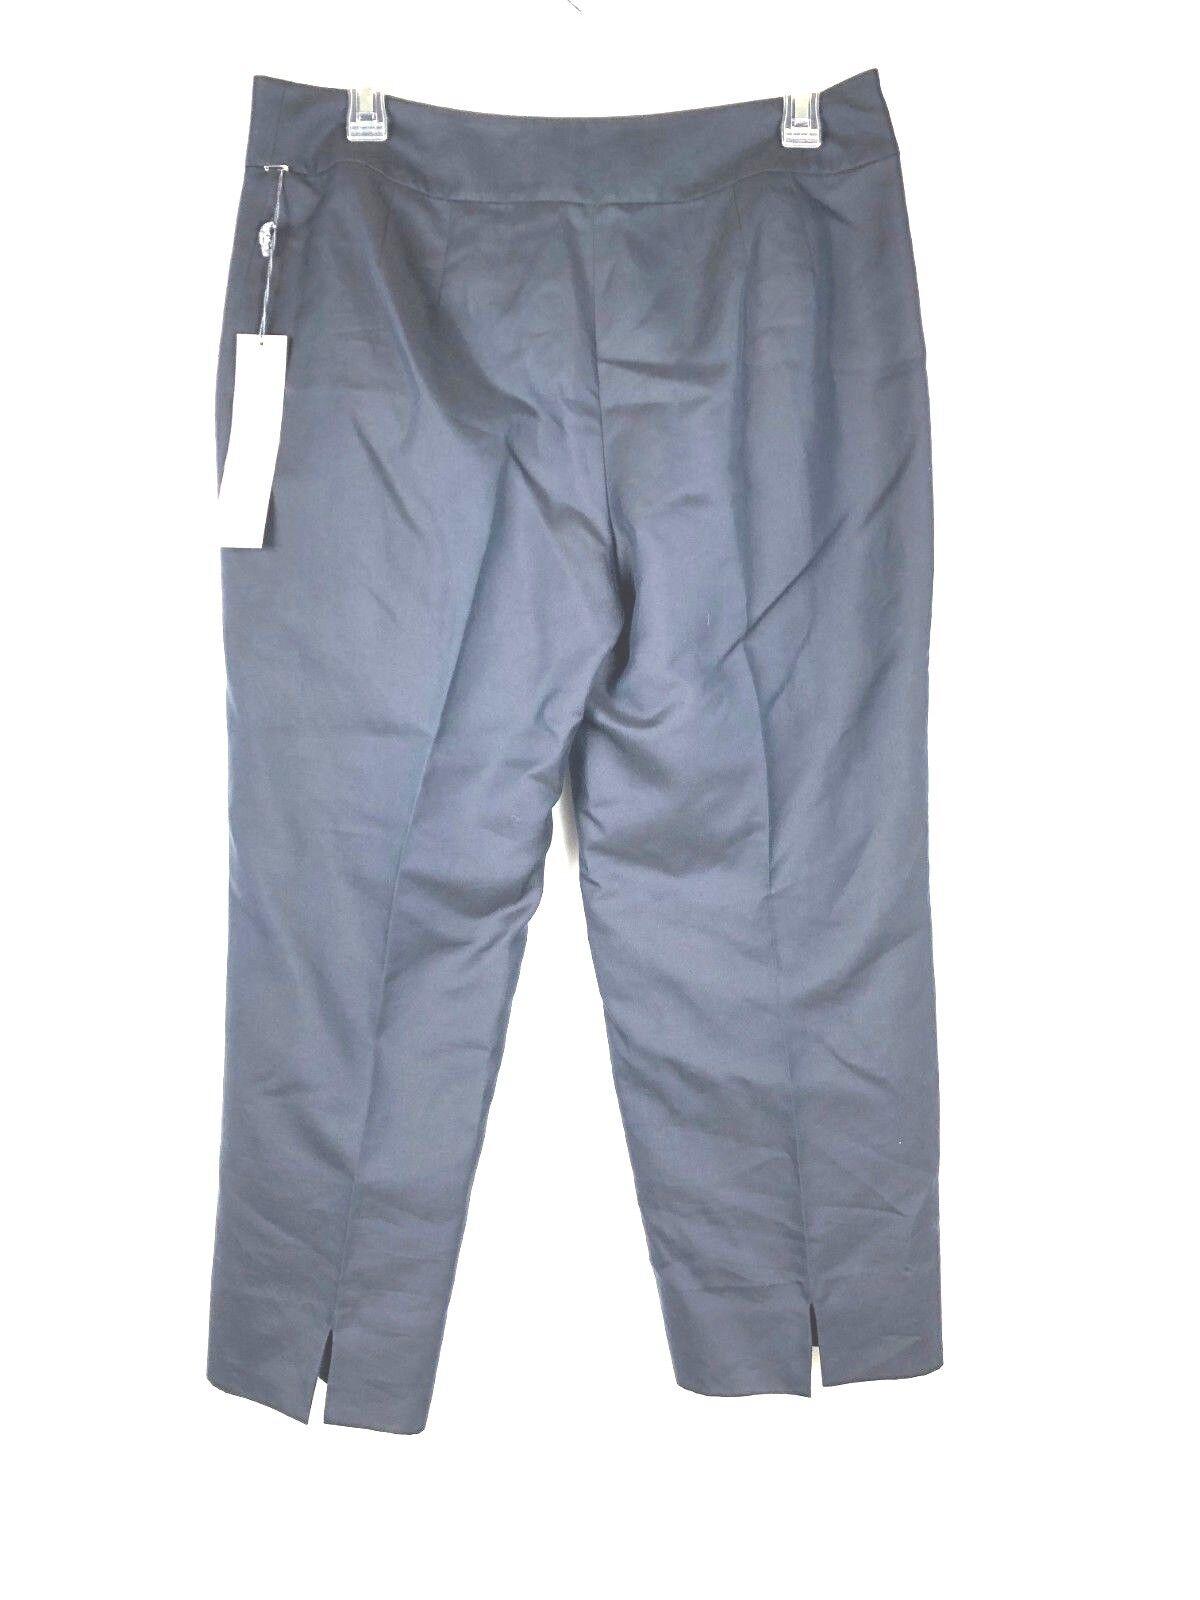 Ann Taylor NWT damen Capri Crop Pants Siz 8 Dark Blau lined Cotton silk Blend 93